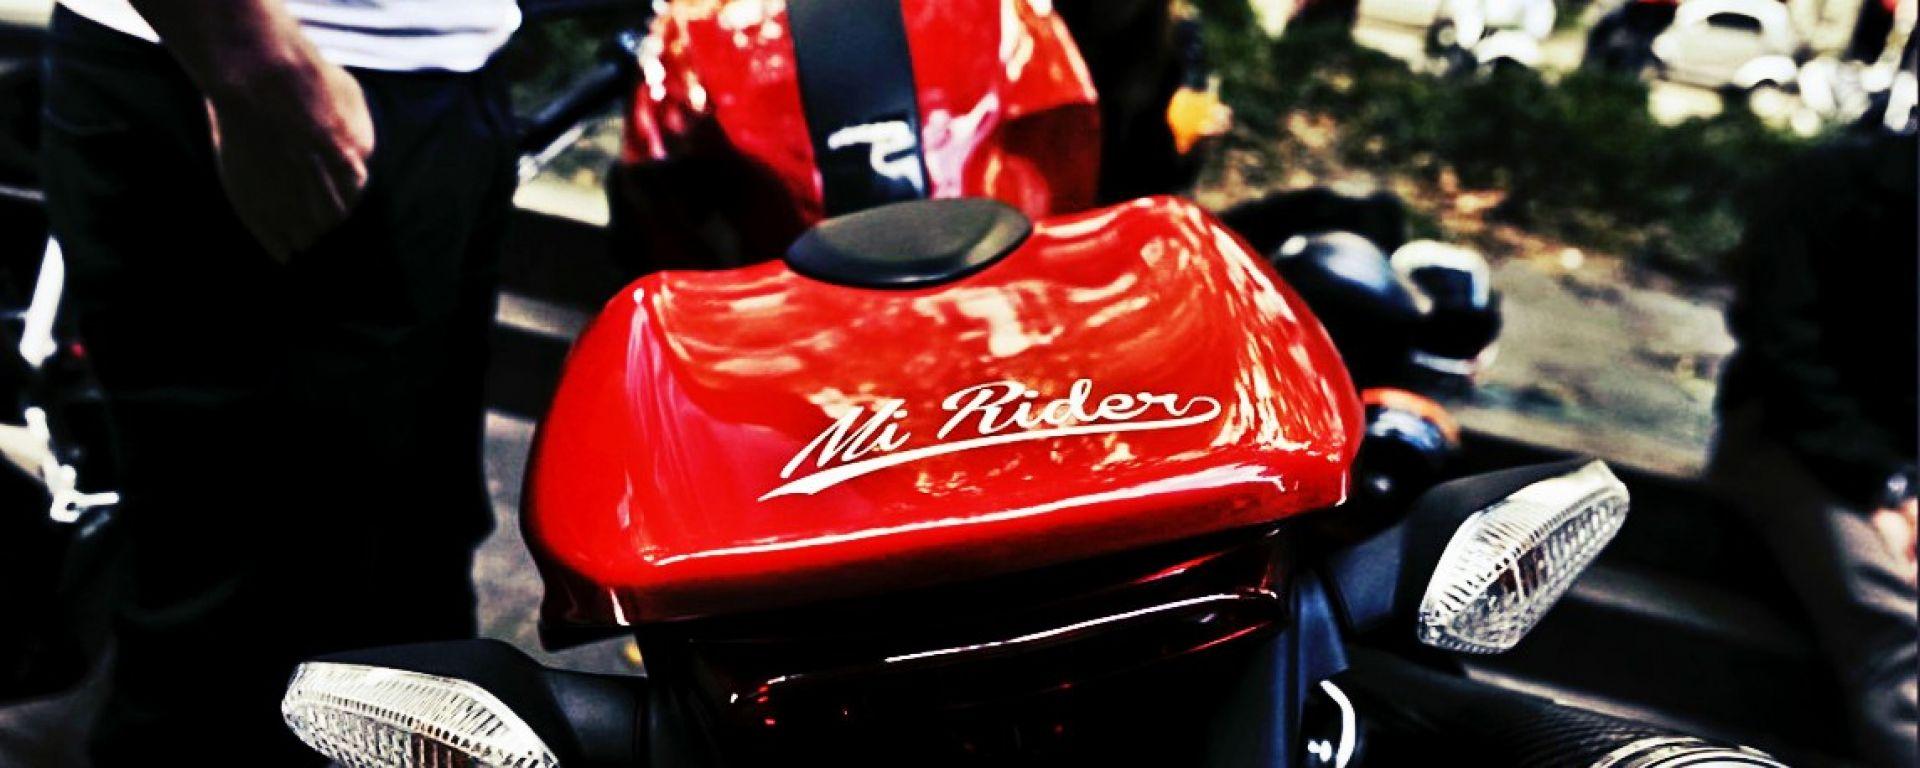 Mi Rider